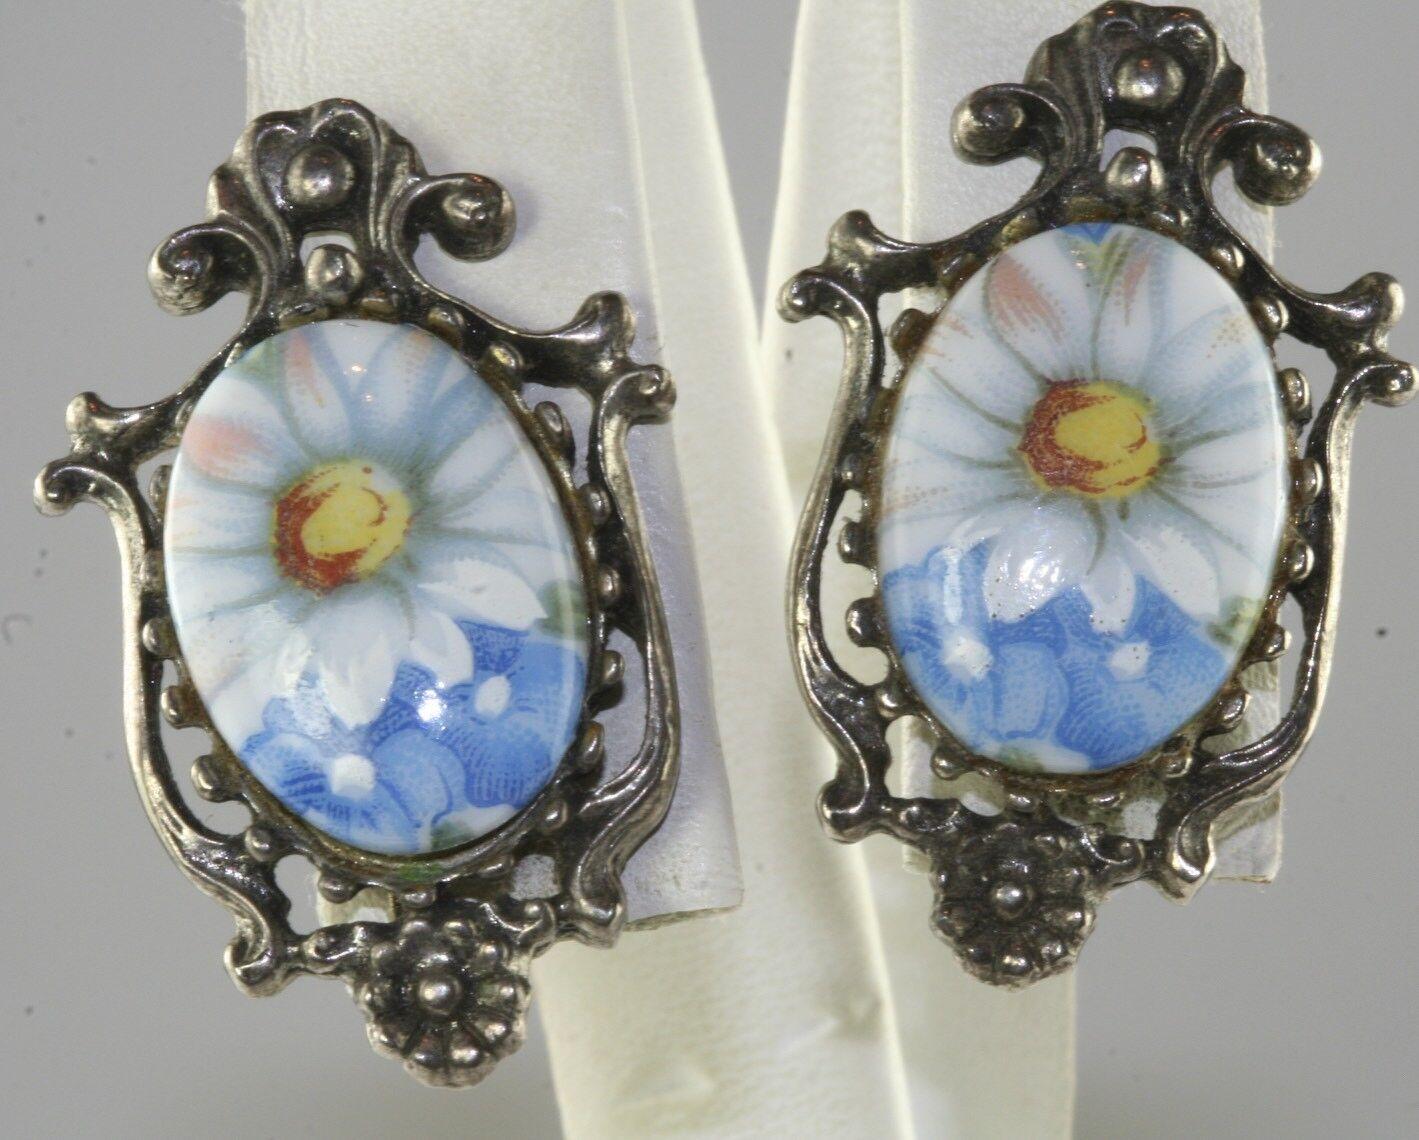 ab35e76f2 VINTAGE FLORENZA PAINTED PORCELAIN DAISY FLOWER EARRINGS CLIP npzanl7605- Earrings